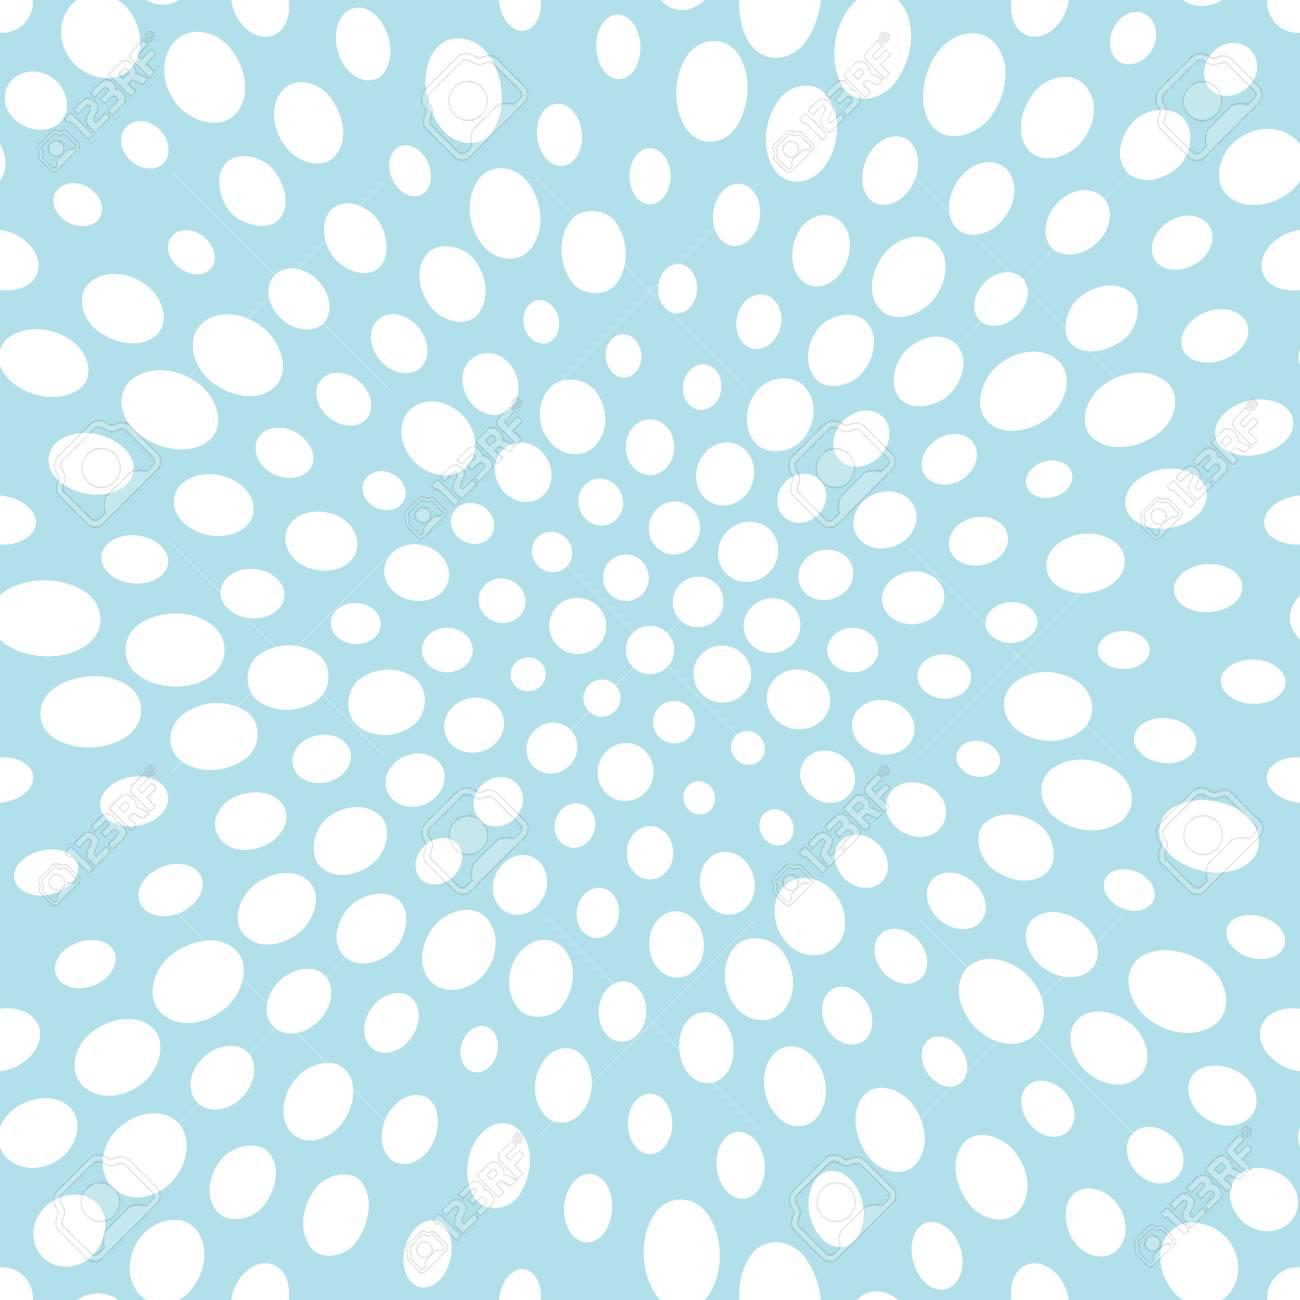 abstract seamless geometric halftone pattern - 124753557